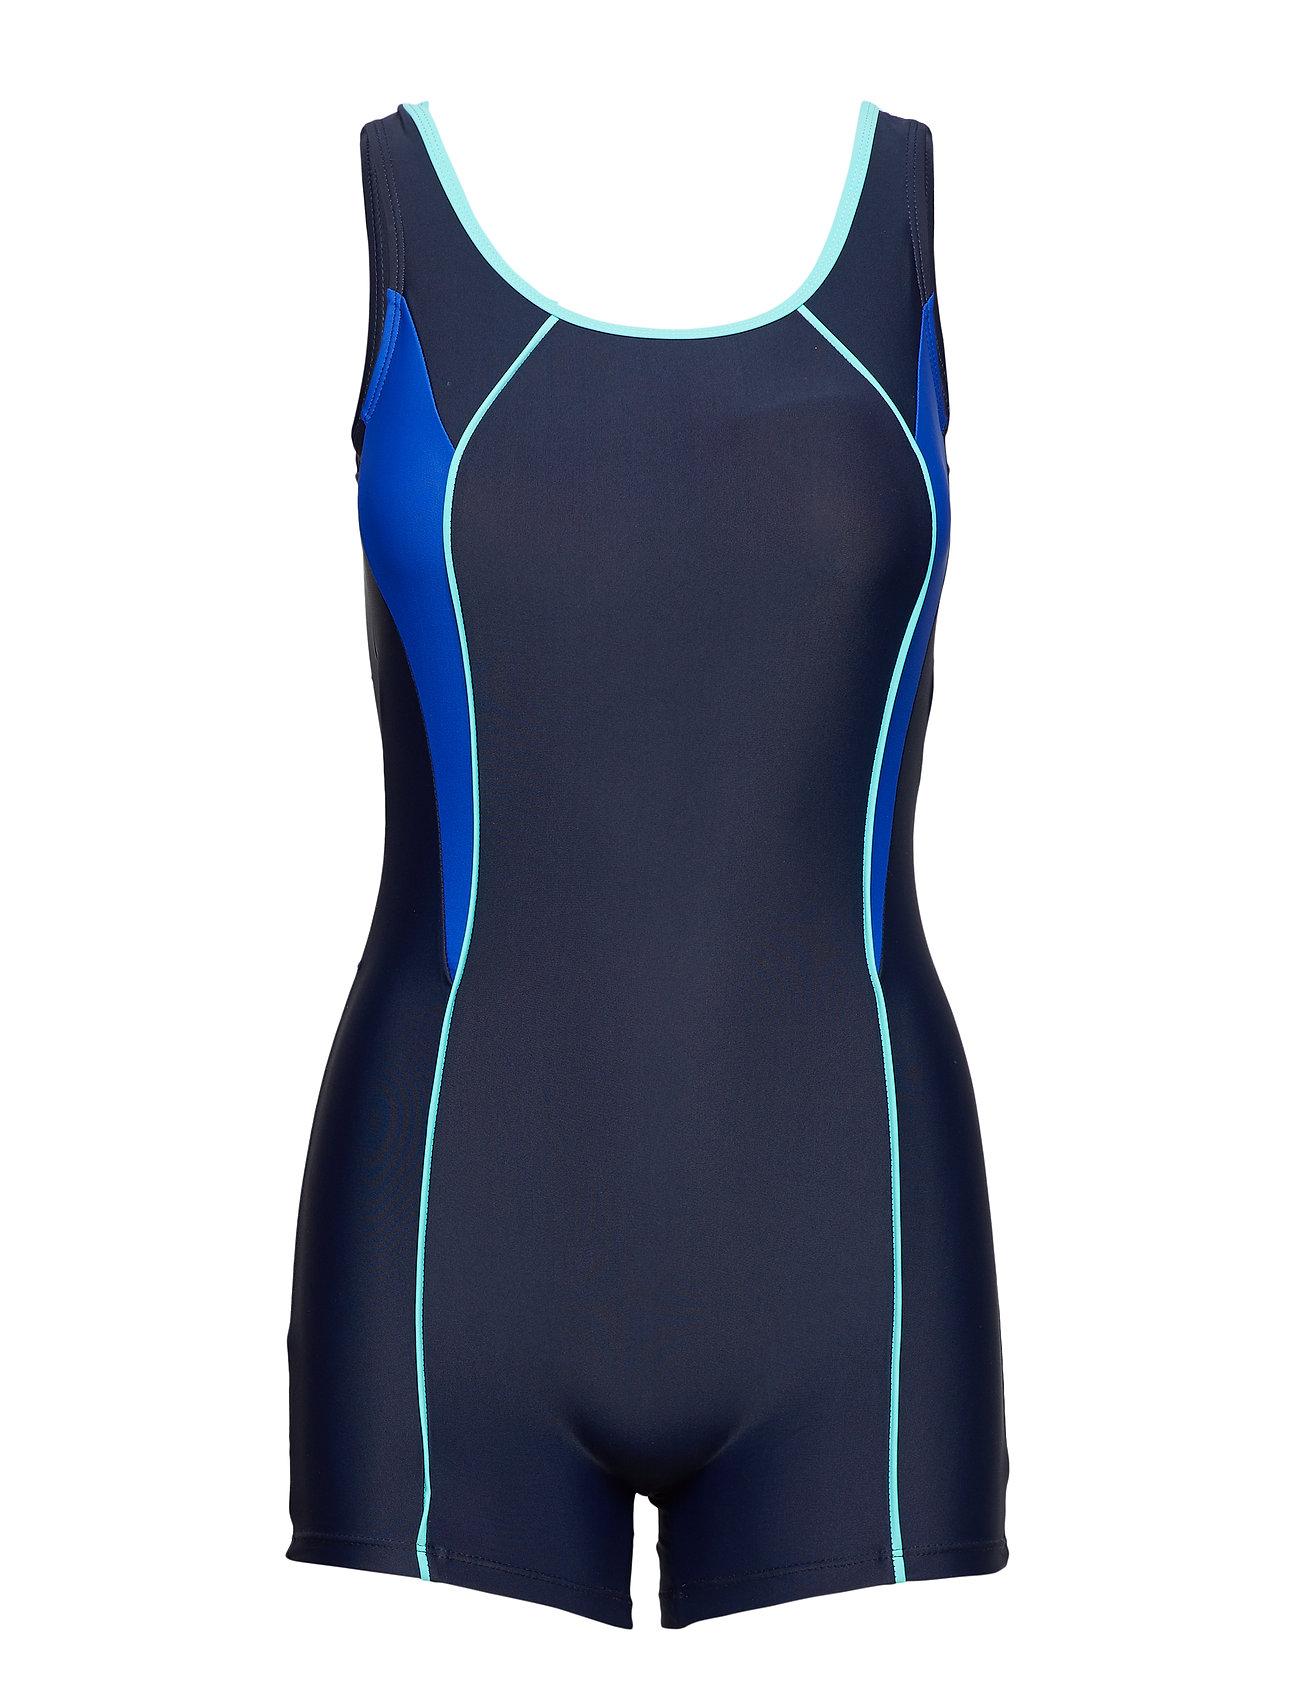 Wiki Swimsuit Regina Sport - NAVY/AQUA